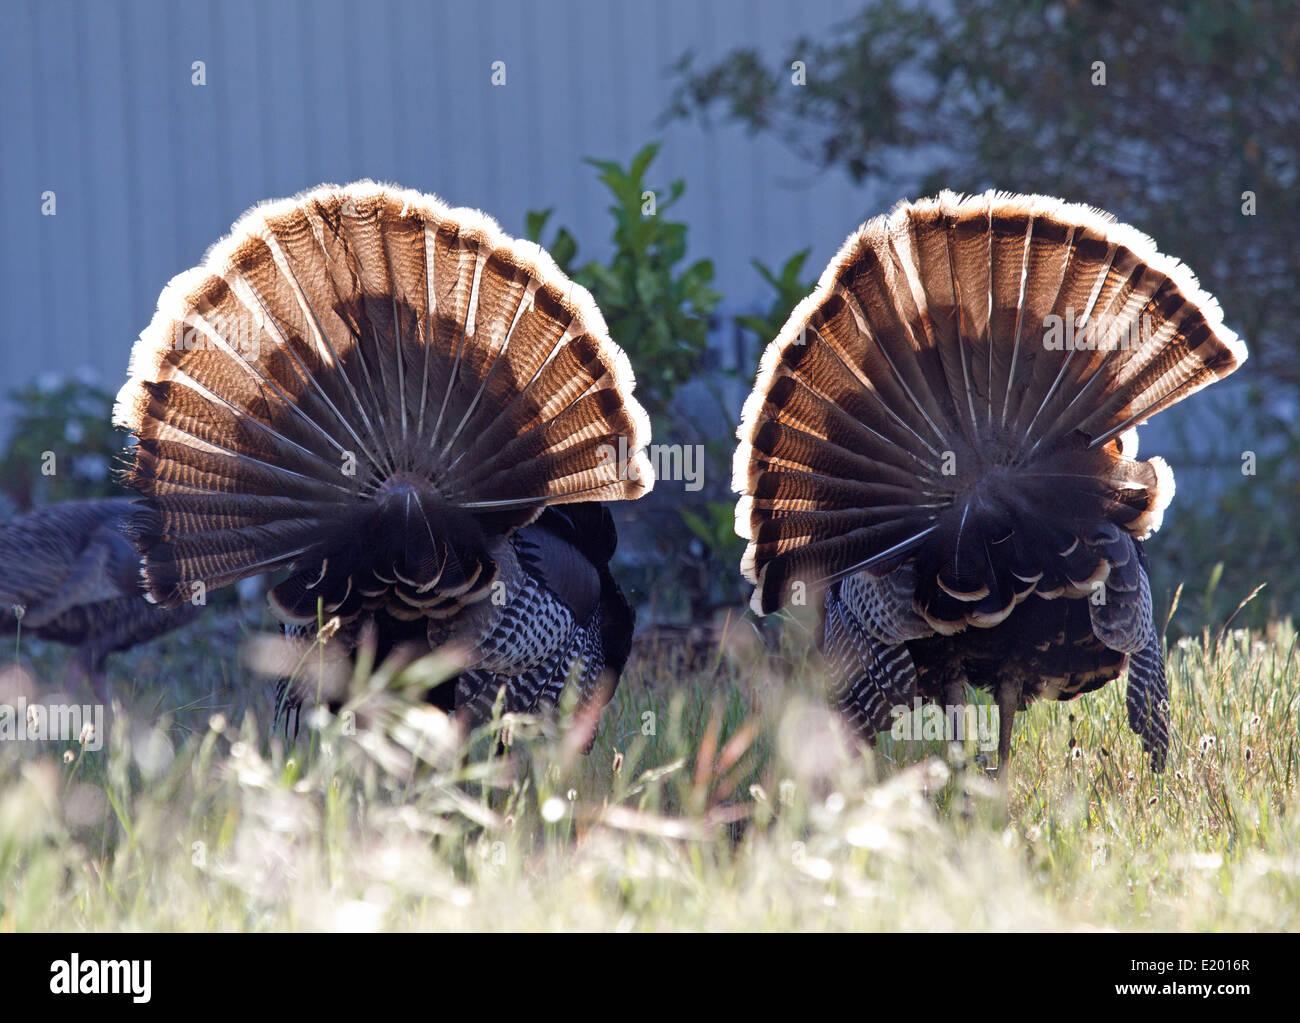 Two Tom Turkeys - Stock Image